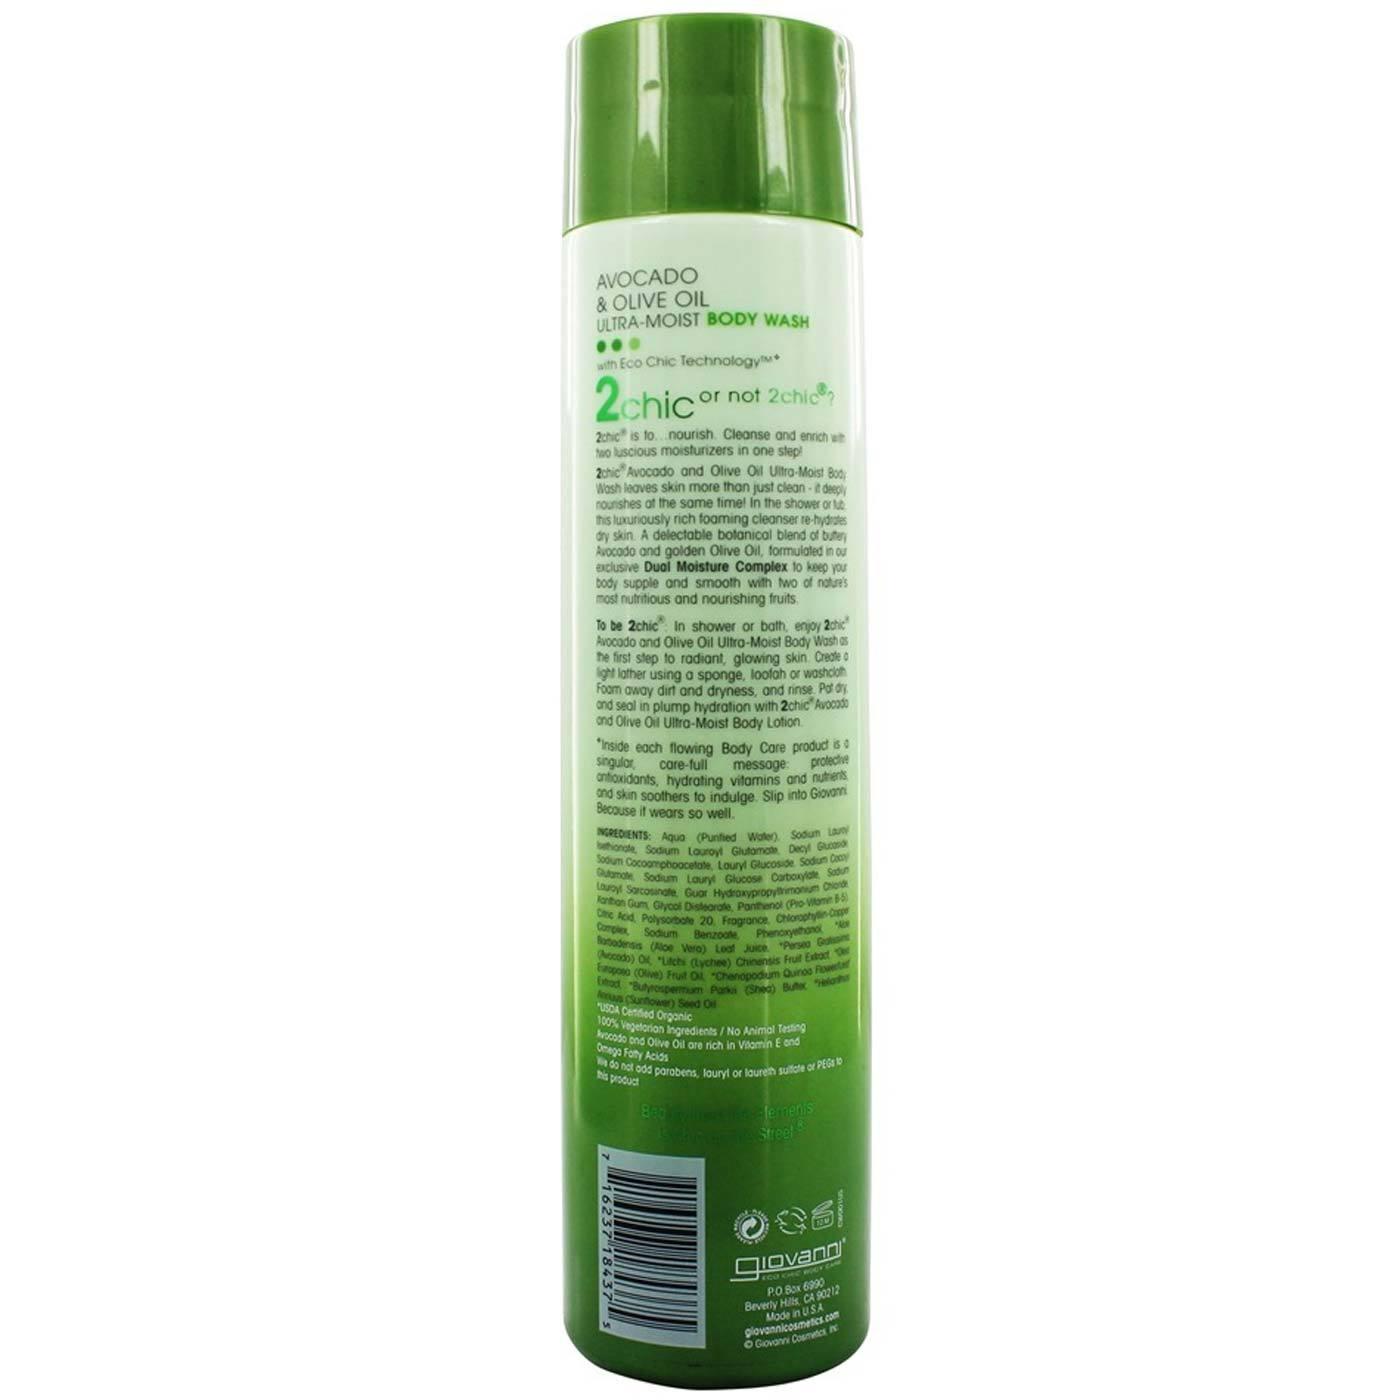 c6fcddd6d8fd Giovanni Hair Care Products 2chic Body Wash Avocado & Olive Oil - 10.5 oz